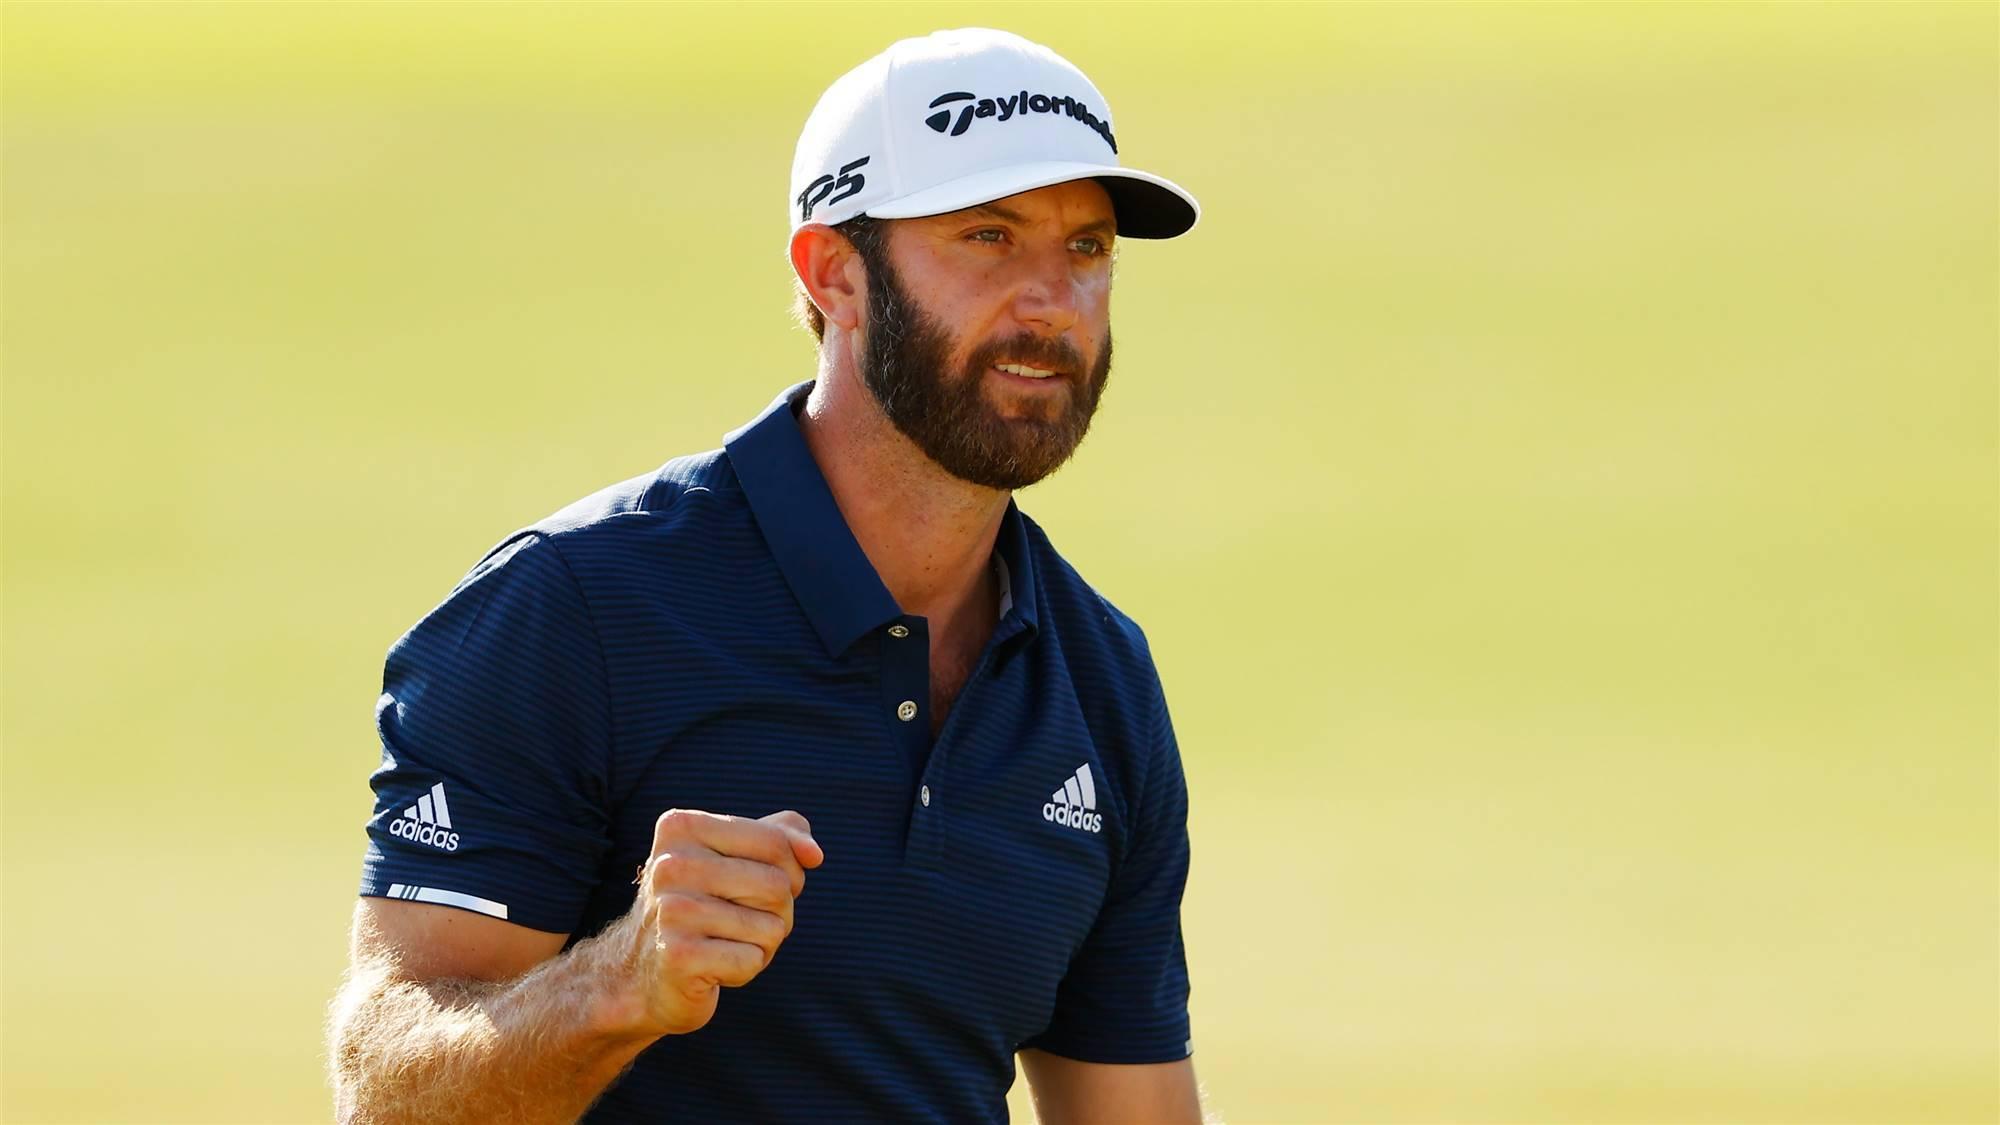 Johnson named PGA Tour Player of the Year - Golf Australia ...